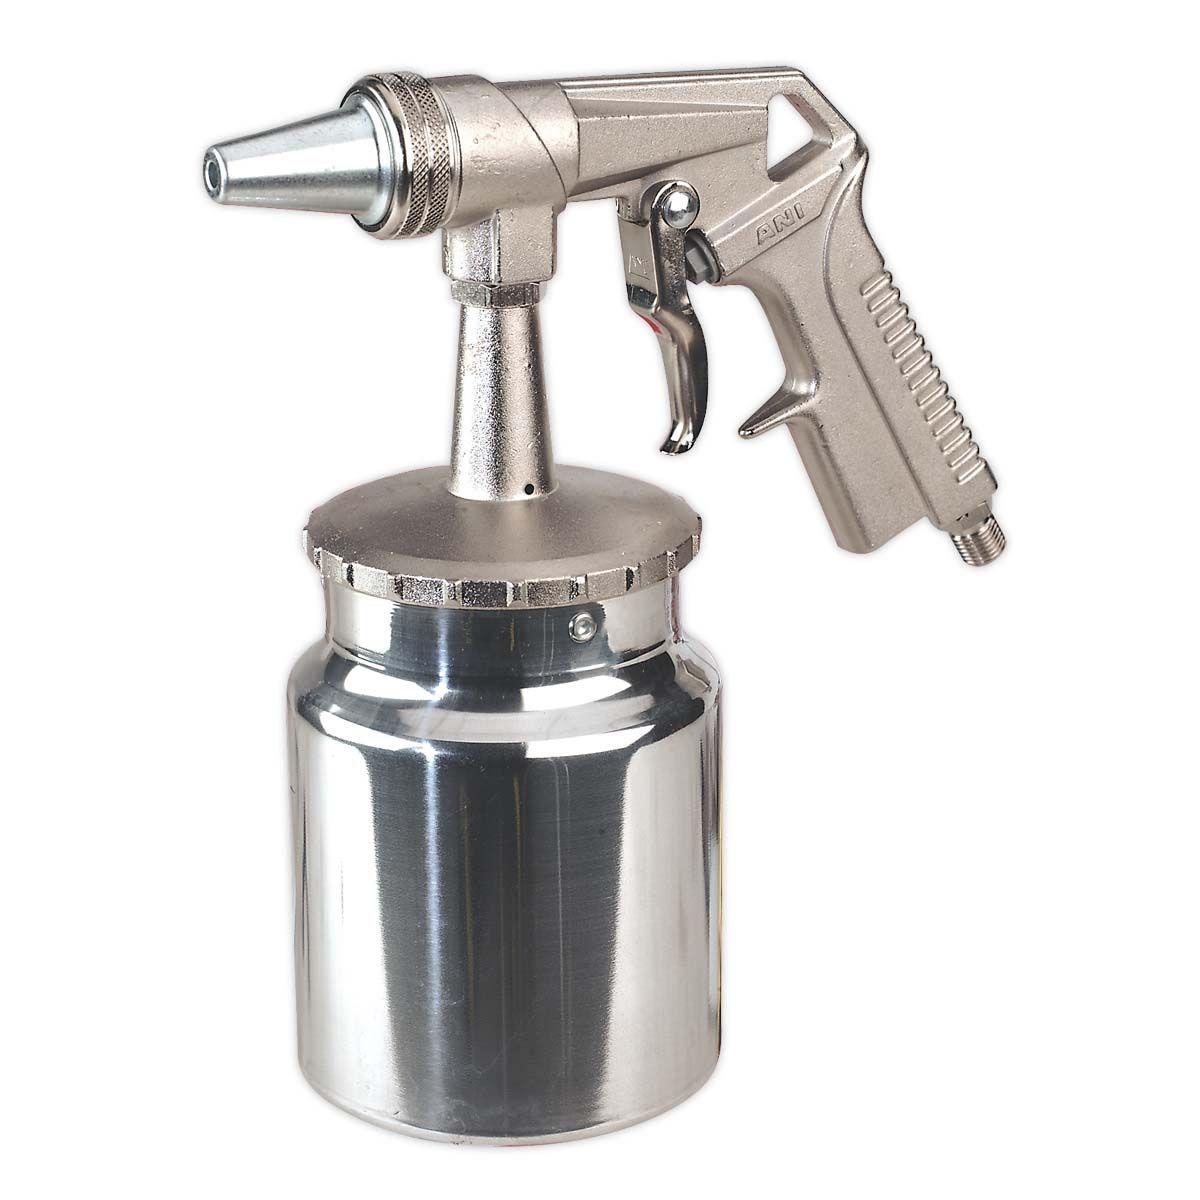 Sealey Sandblasting Gun with 6mm Nozzle